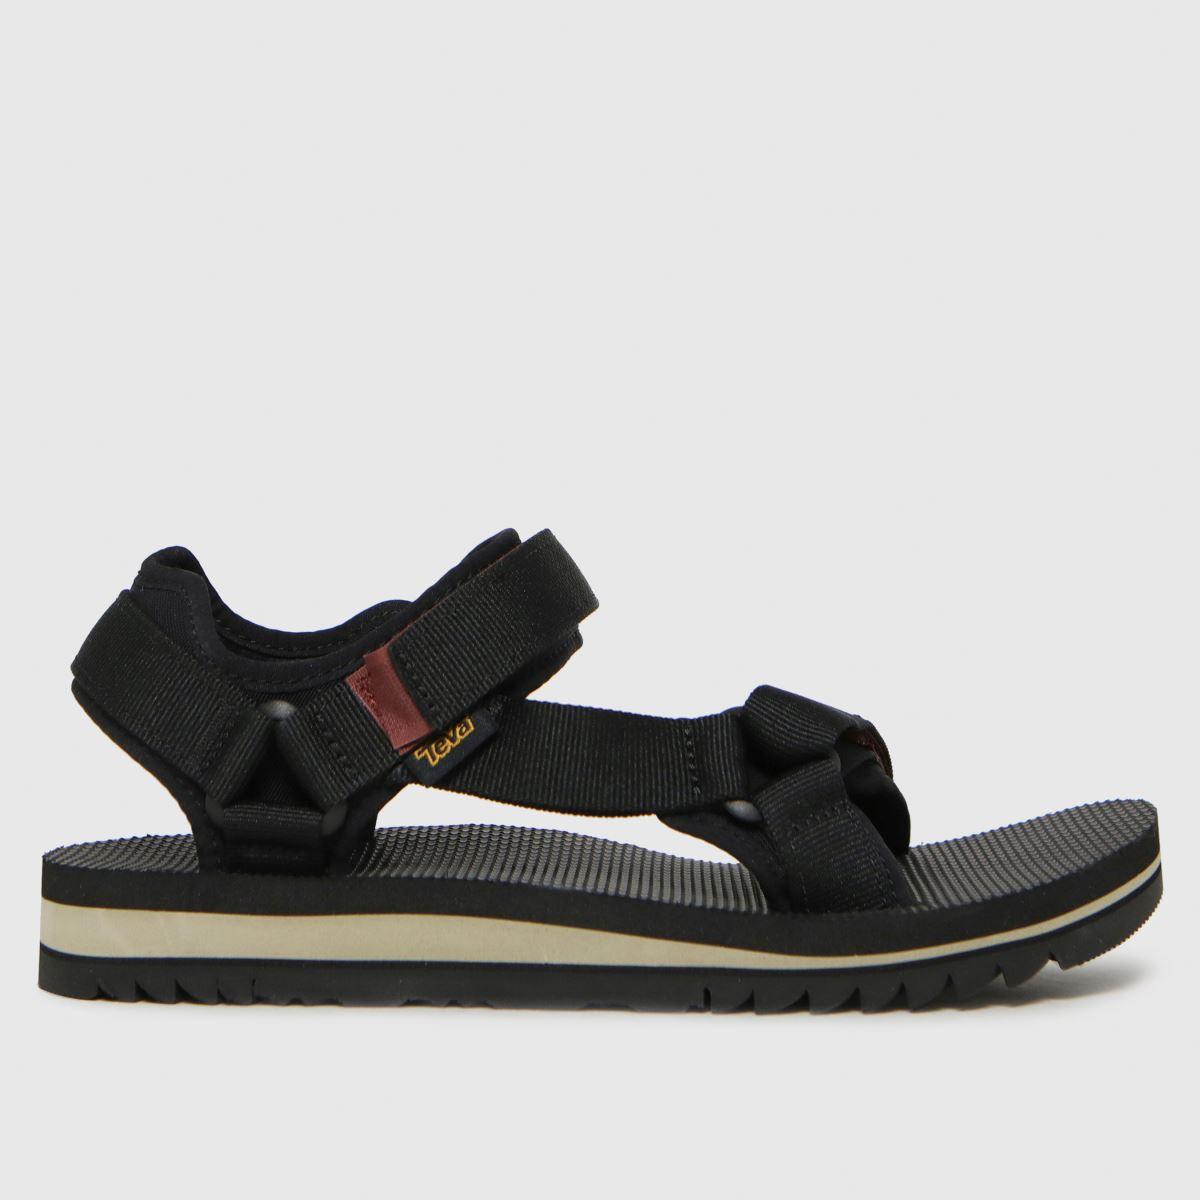 Teva Black Universal Trail Sandals